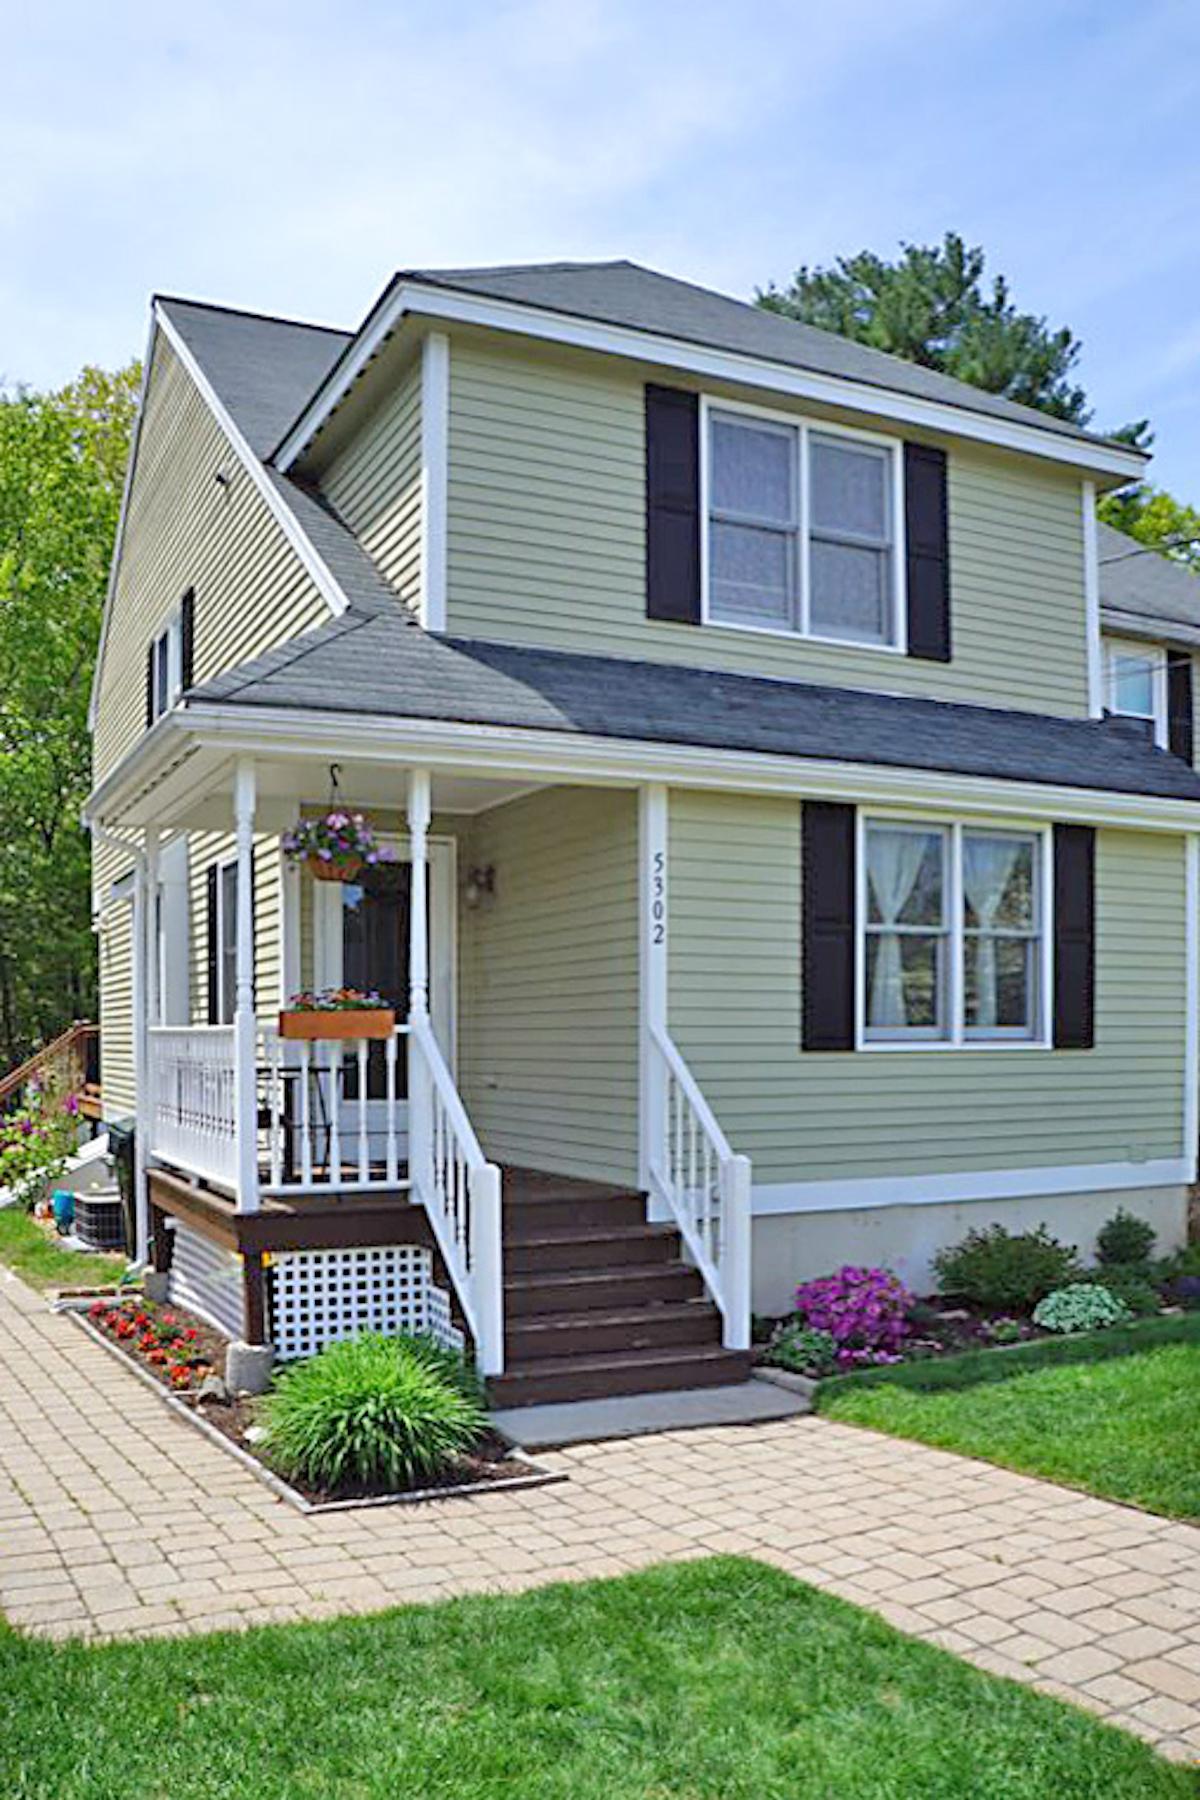 Single Family Homes για την Πώληση στο Wilmington, Μασαχουσετη 01887 Ηνωμένες Πολιτείες